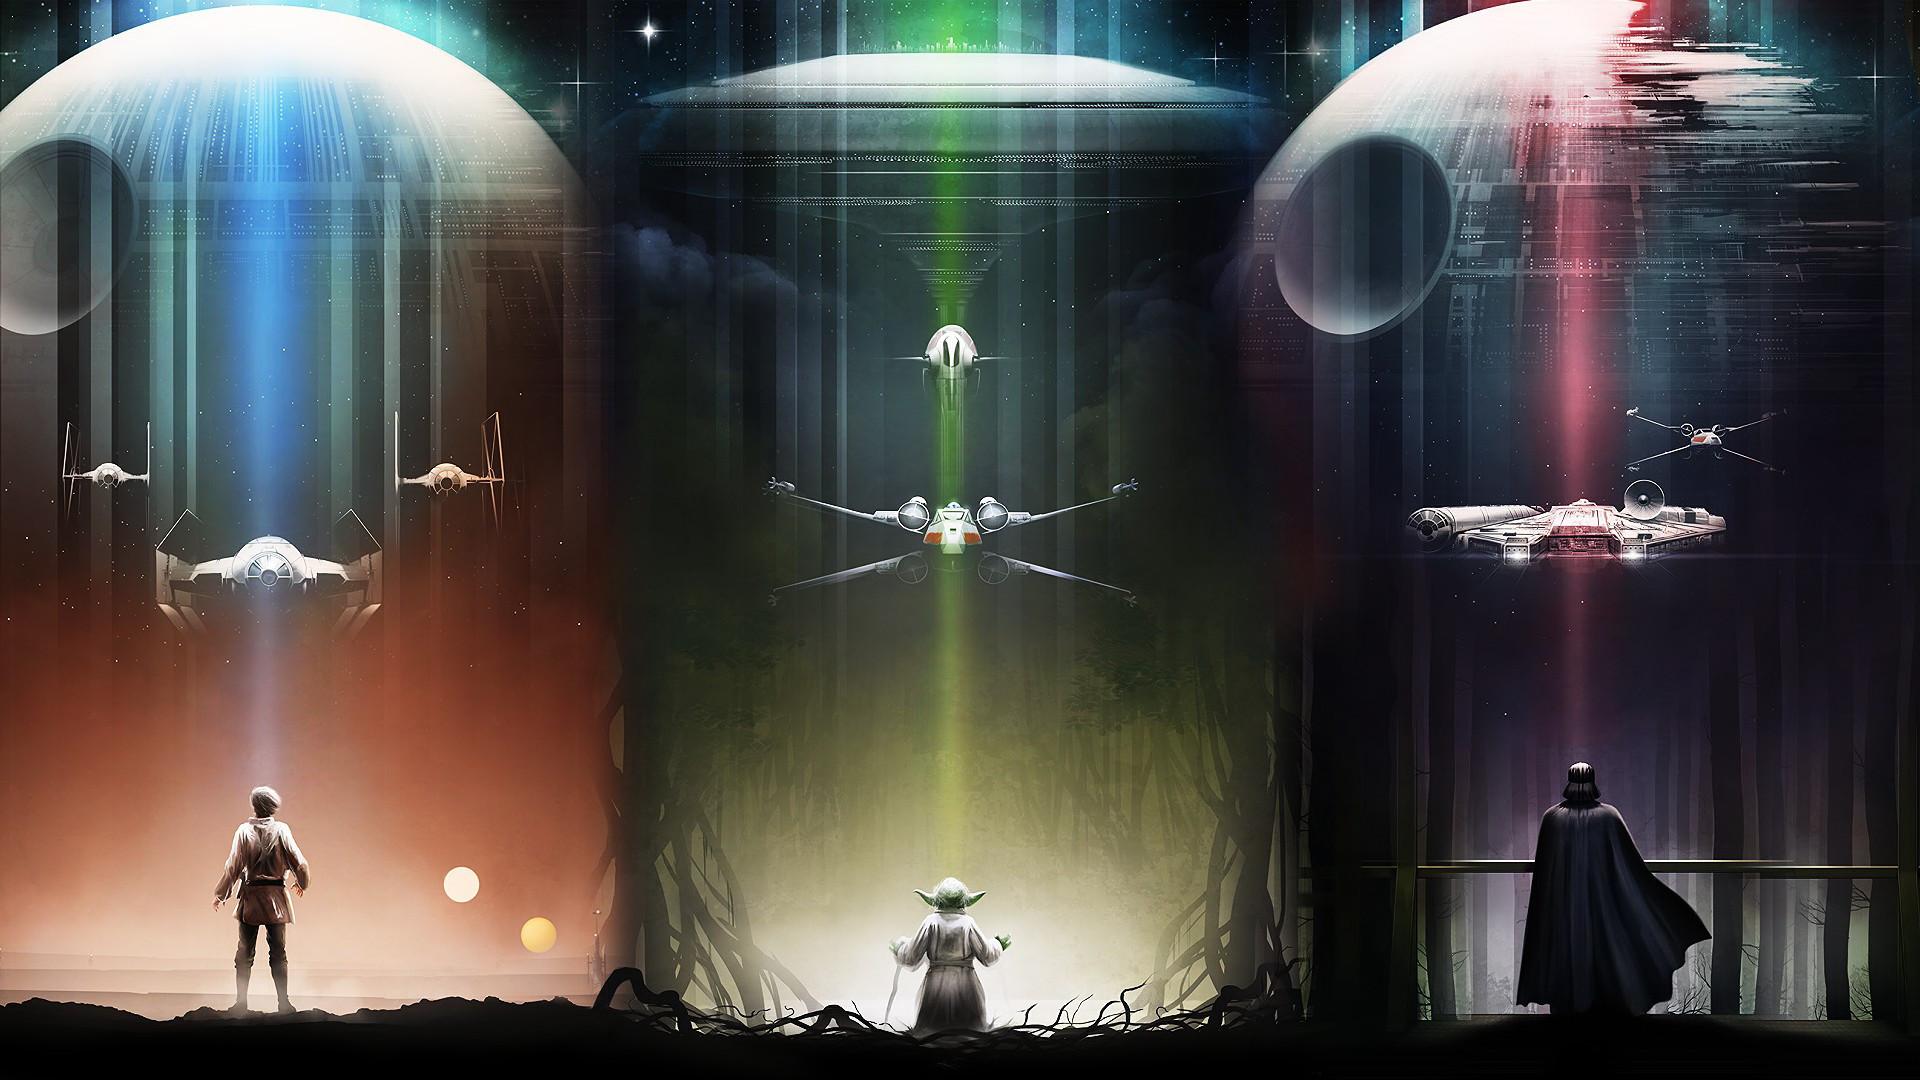 Star Wars Episode IV - A New Hope - IMDb